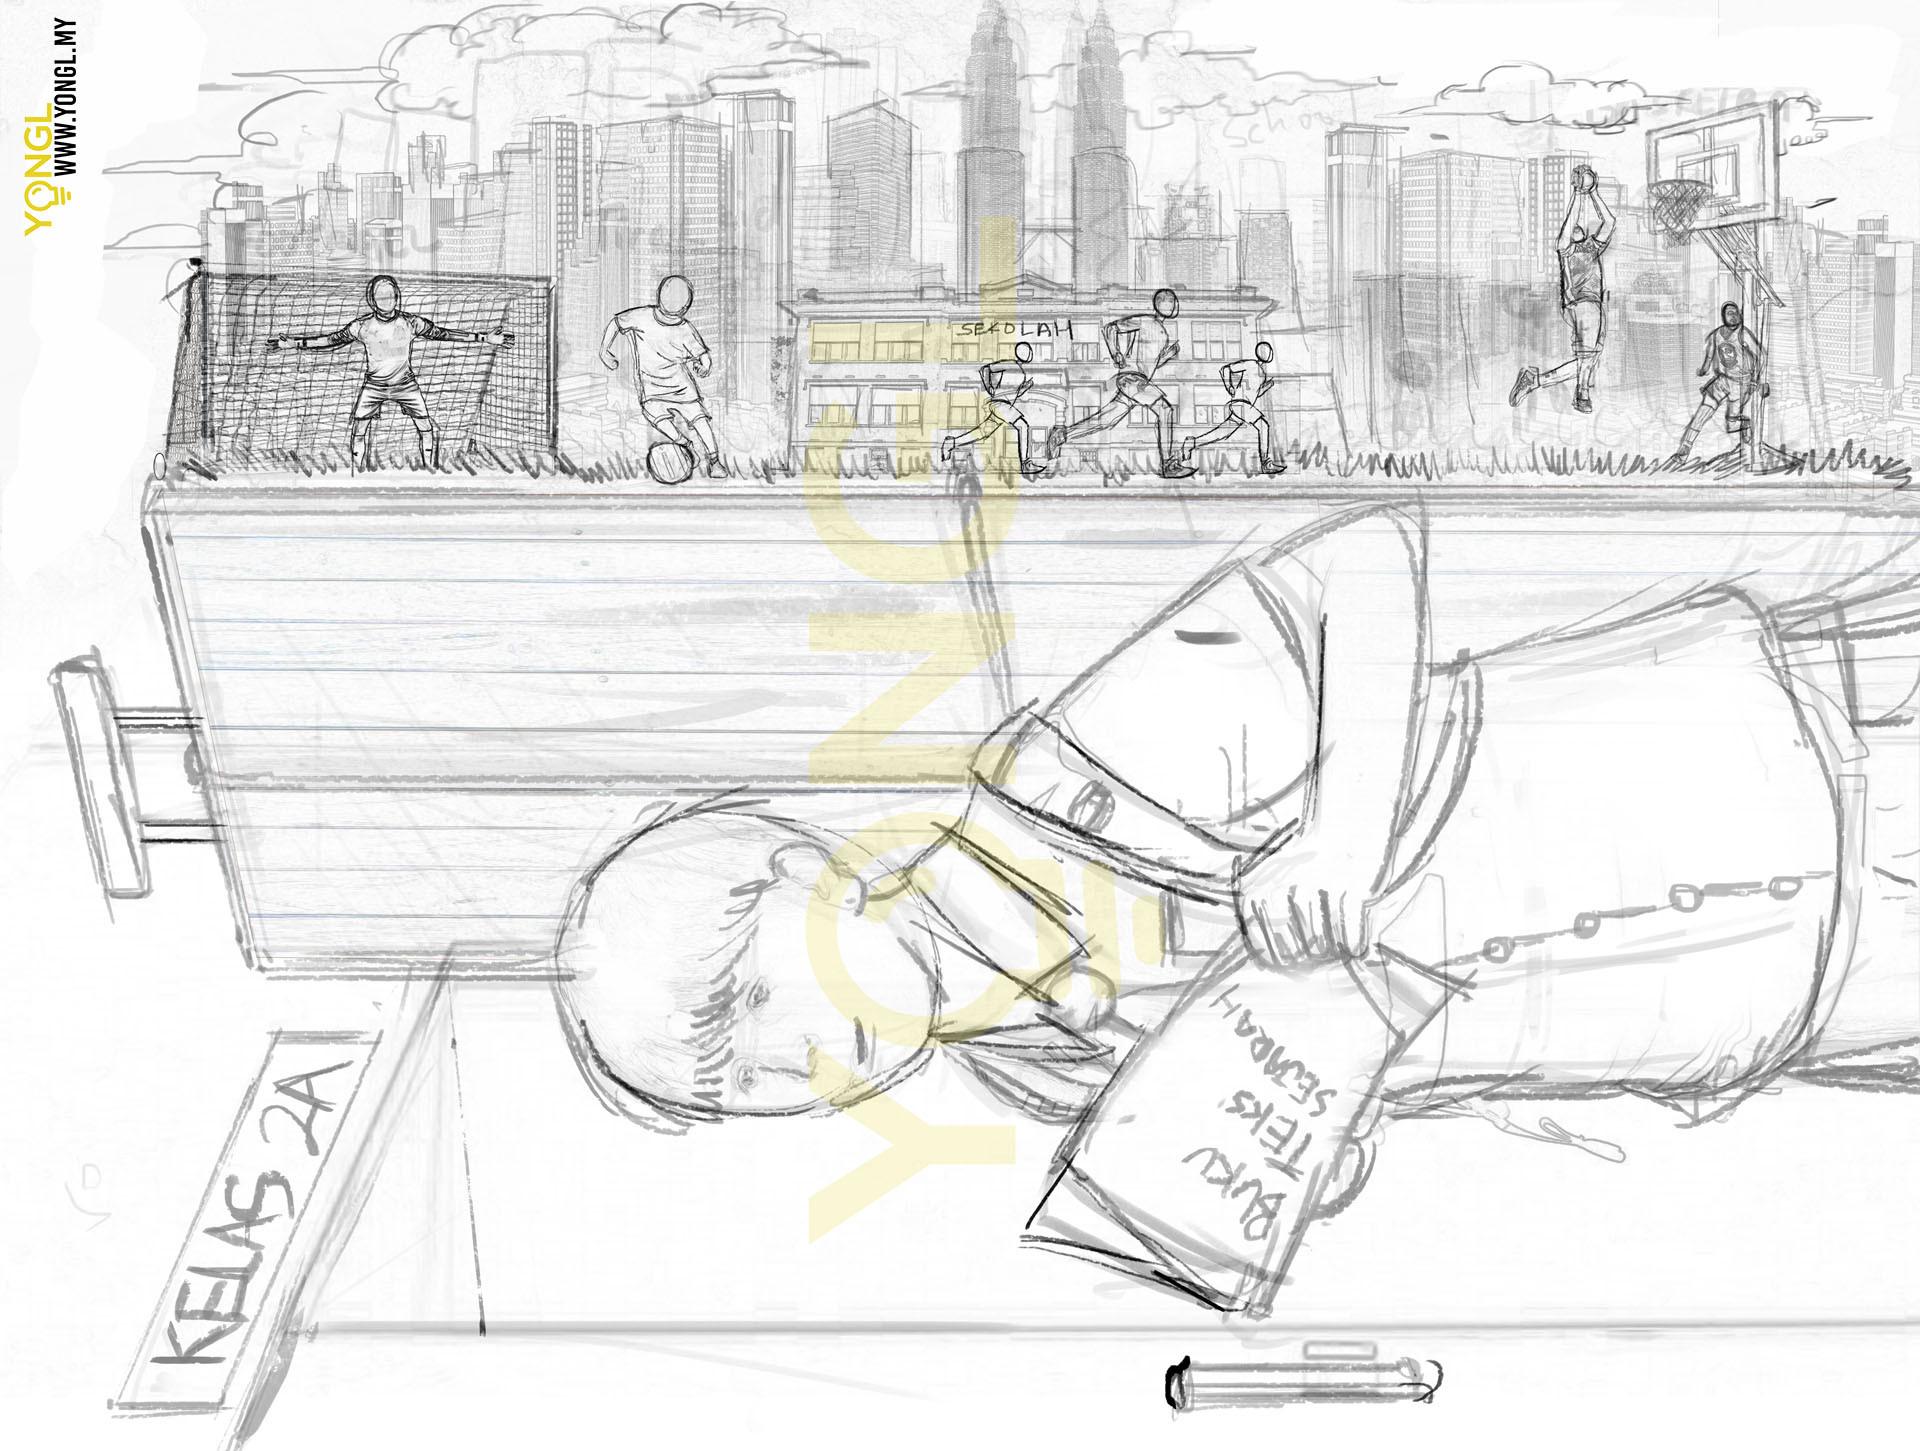 The Unseen Struggle, Nestle Milo - Imaginative & Conceptual